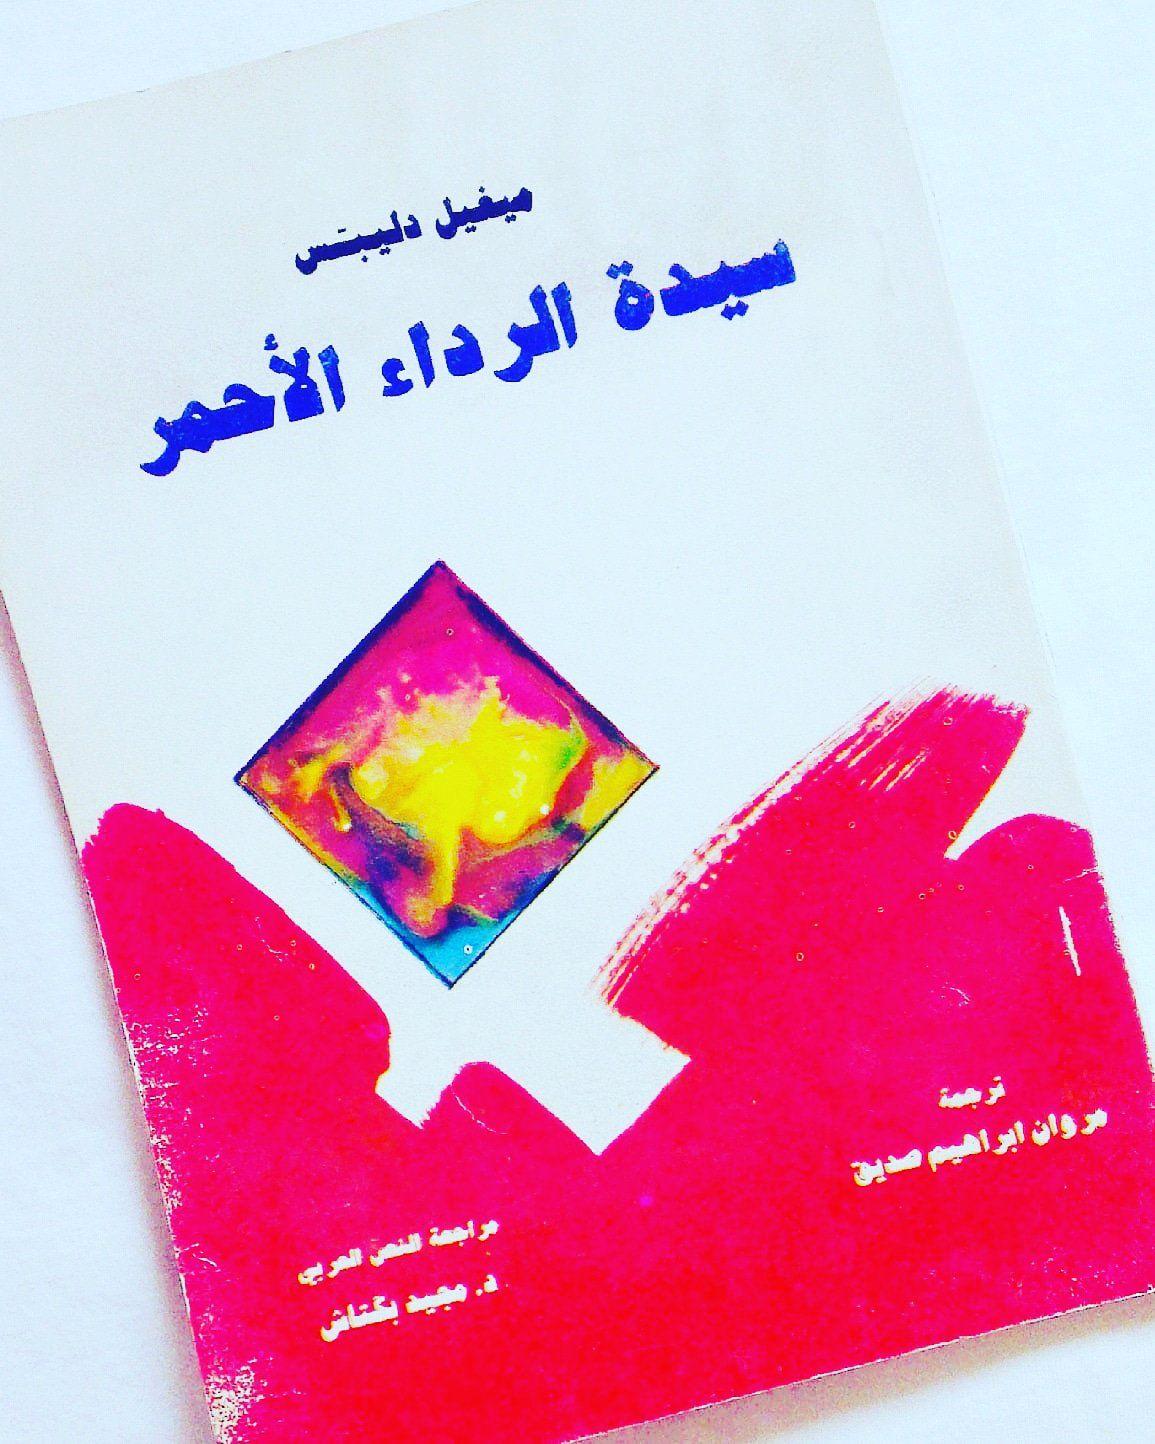 Pin by Najlaa Alhaj on كتب وأفلام Logos